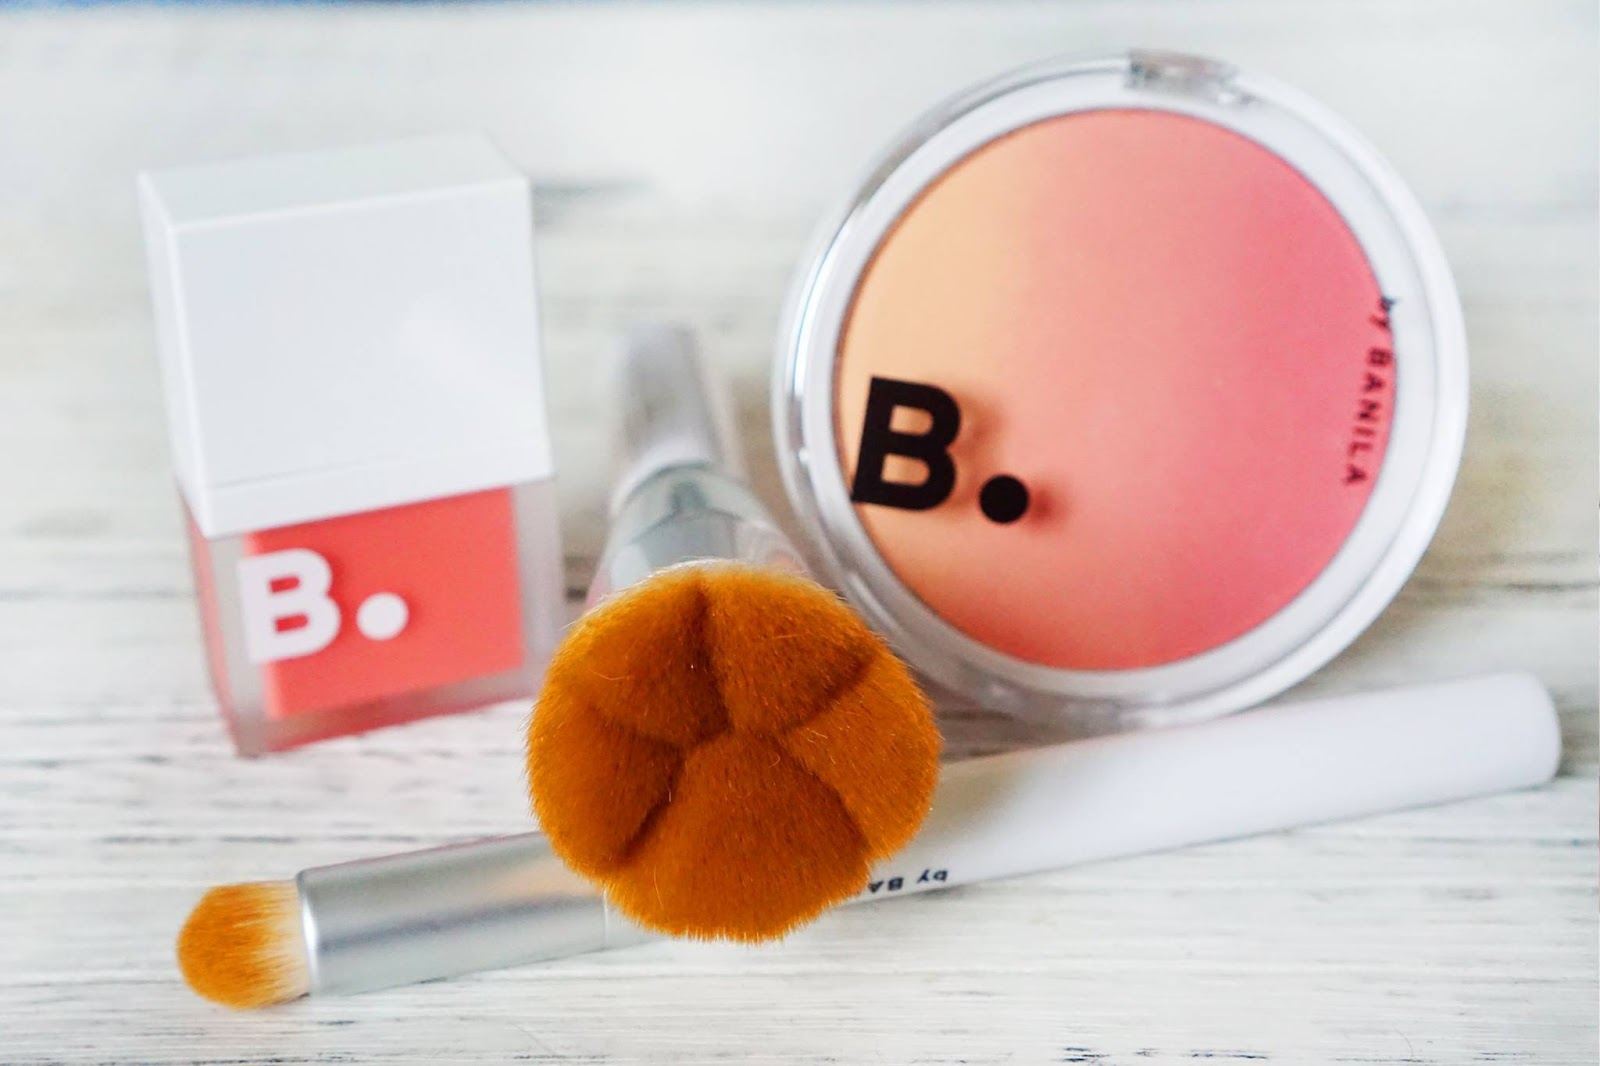 e6bb43f02f88 而我係雜誌曾經介紹 (https   goo.gl TLf9tT) 的 B. by Banila 歌基肉球胭脂蜜粉掃及小尾巴眼影掃都係莎莎搵到。